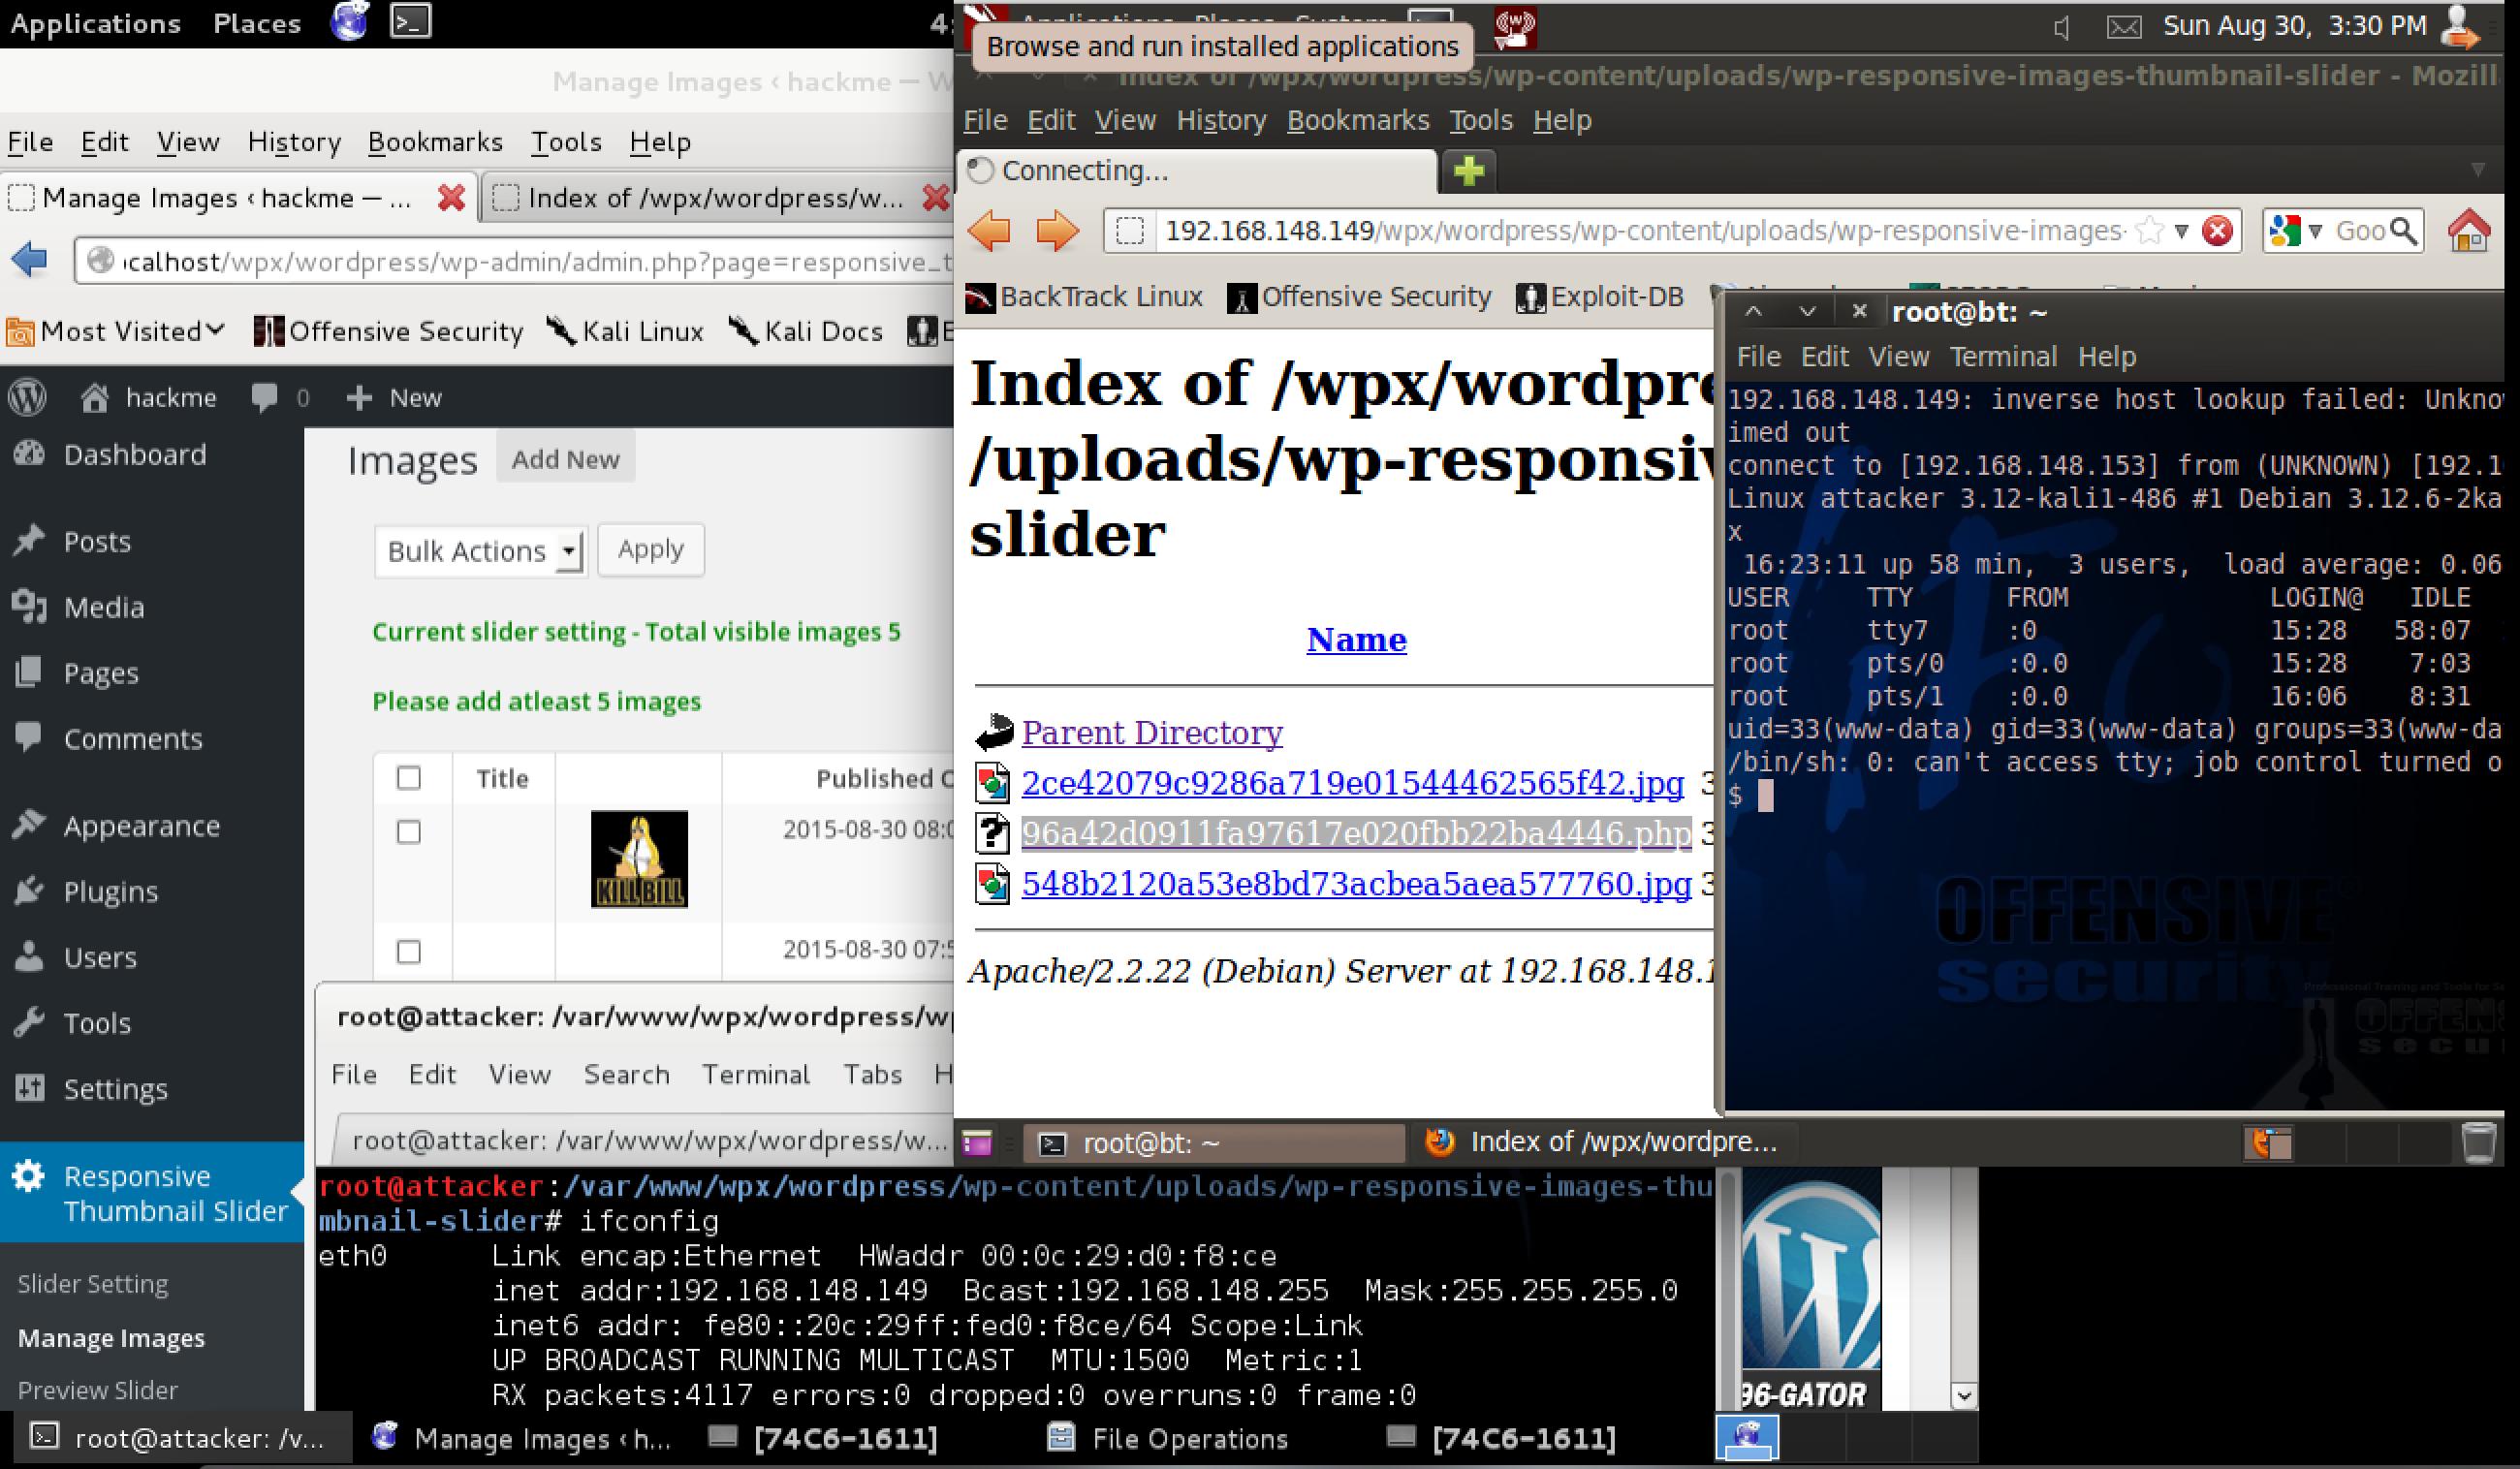 WordPress Plugin Responsive Thumbnail Slider 1 0 - Arbitrary